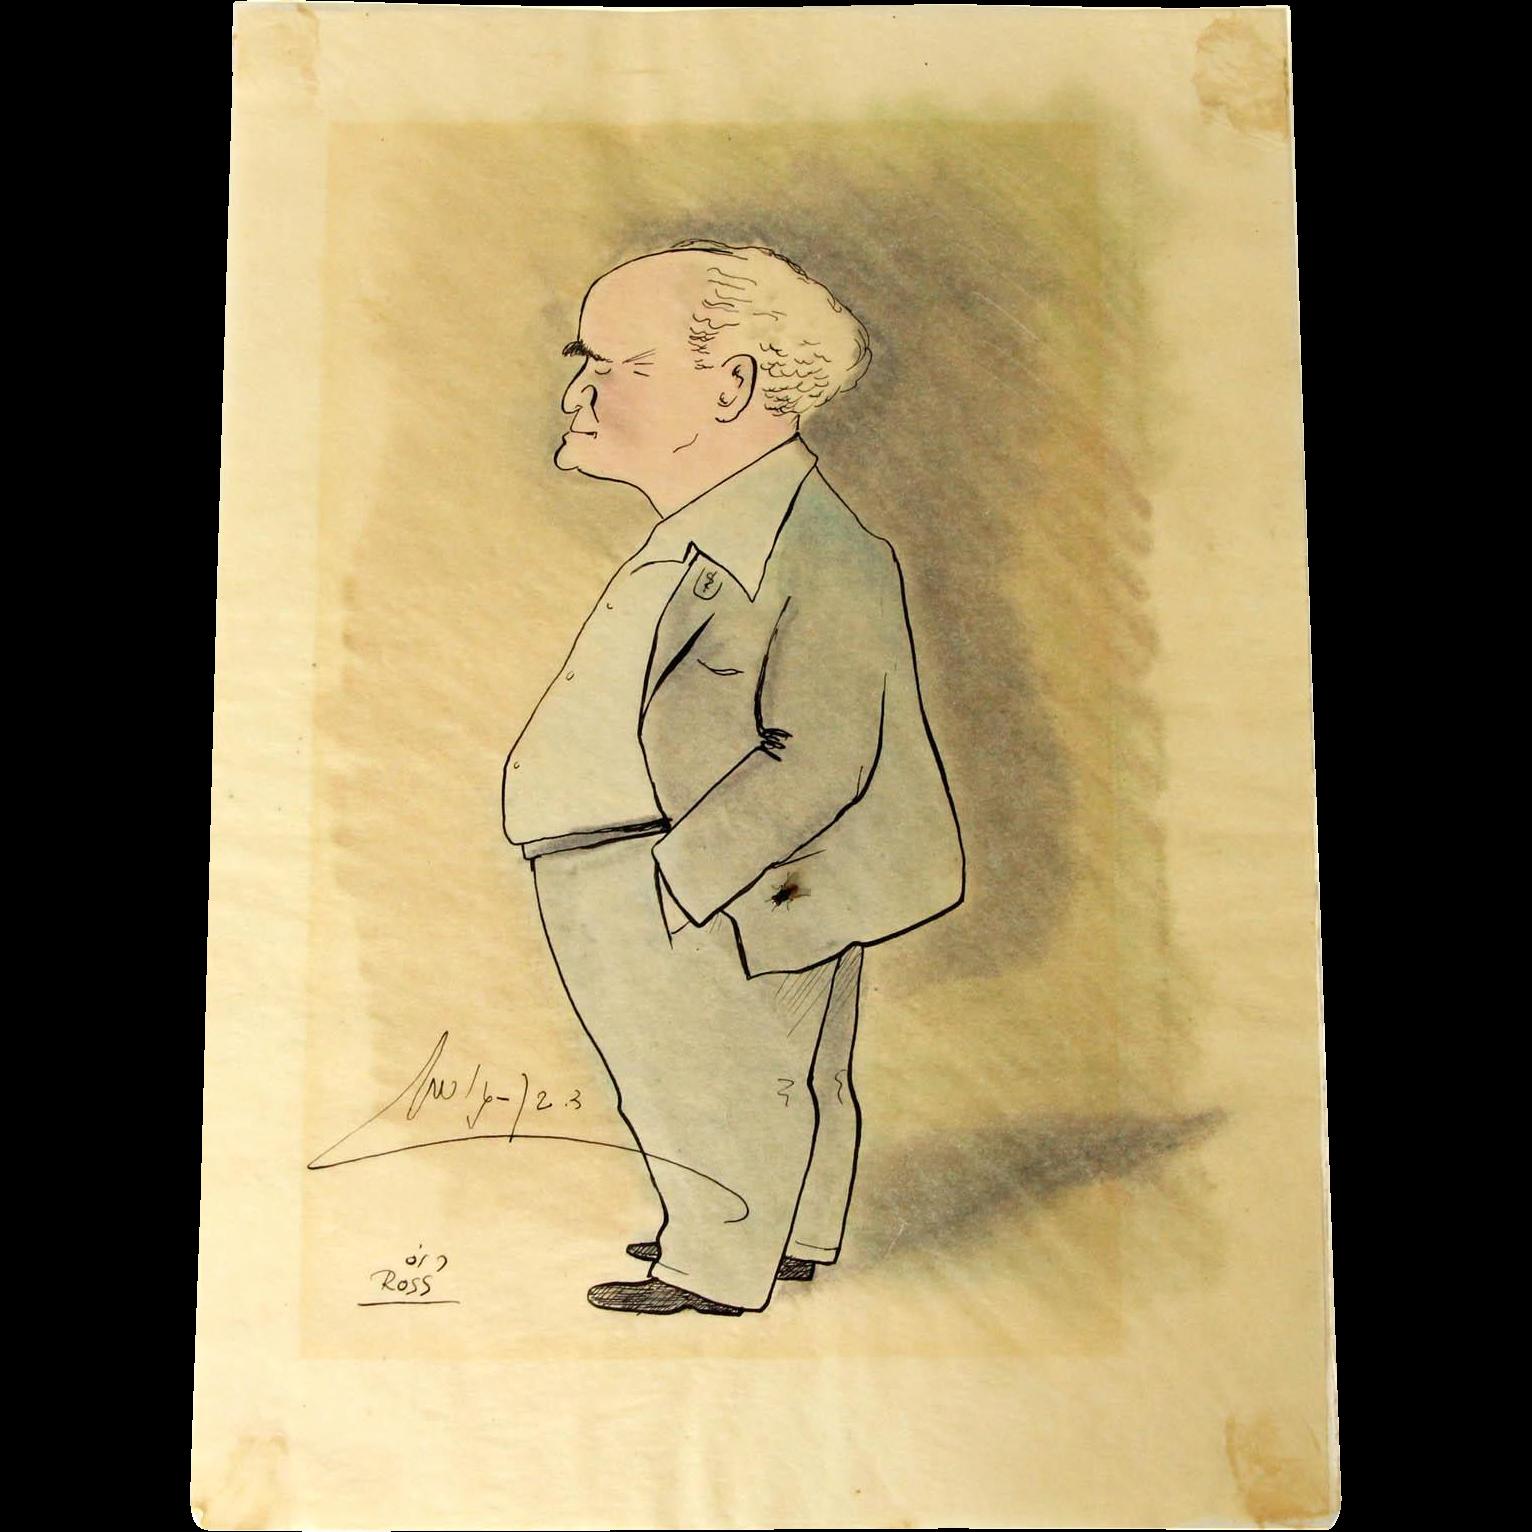 David Ben-Gurion Caricature by Joseph Ross, Signed by Ben-Gurion, Israel, 1950's.